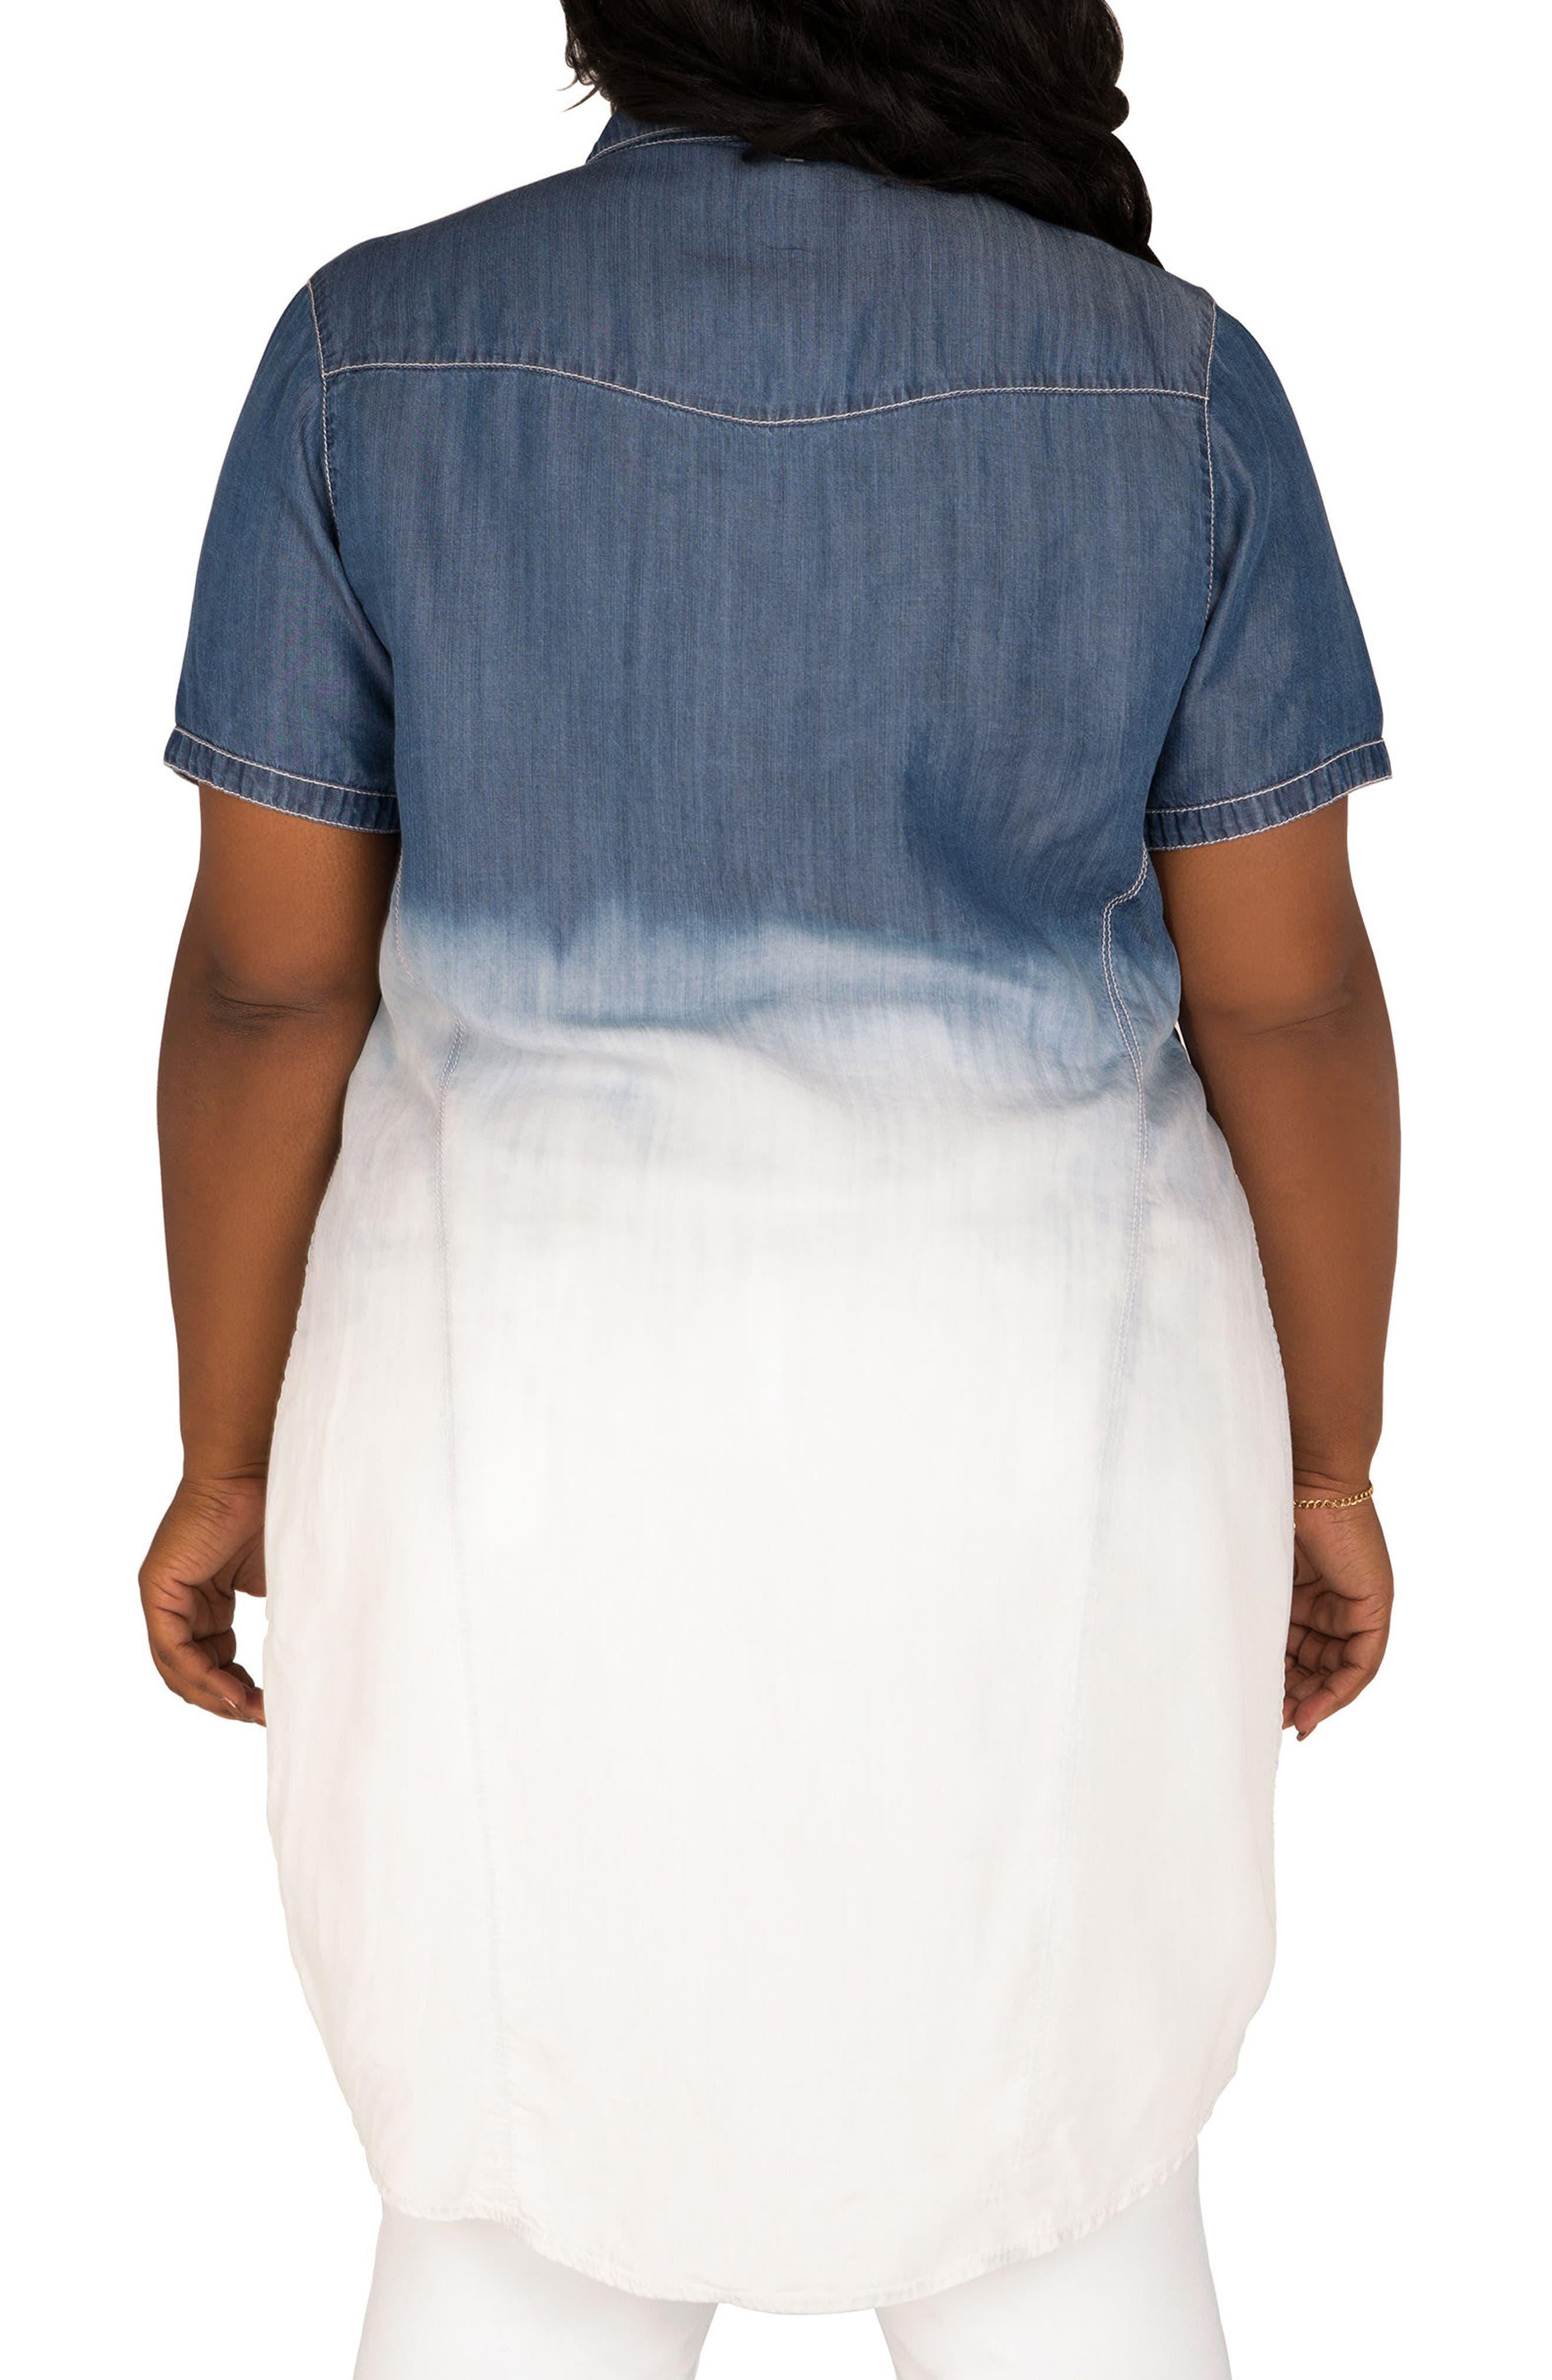 POETIC JUSTICE,                             Regina Ombré Denim Tunic Shirt,                             Alternate thumbnail 2, color,                             BLUE